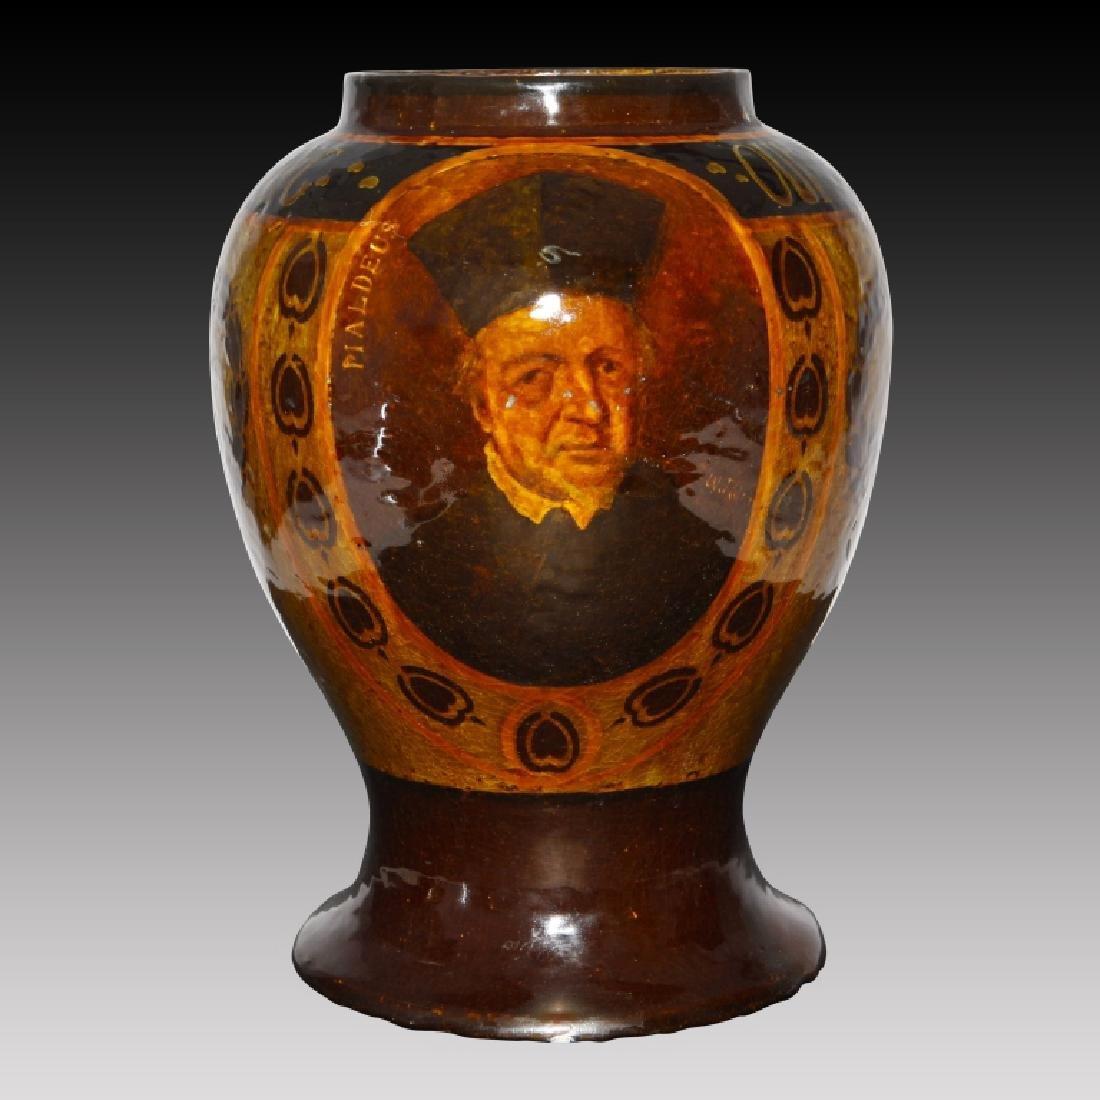 Monumental Doulton Rembrandt Ware Cardinal Vase